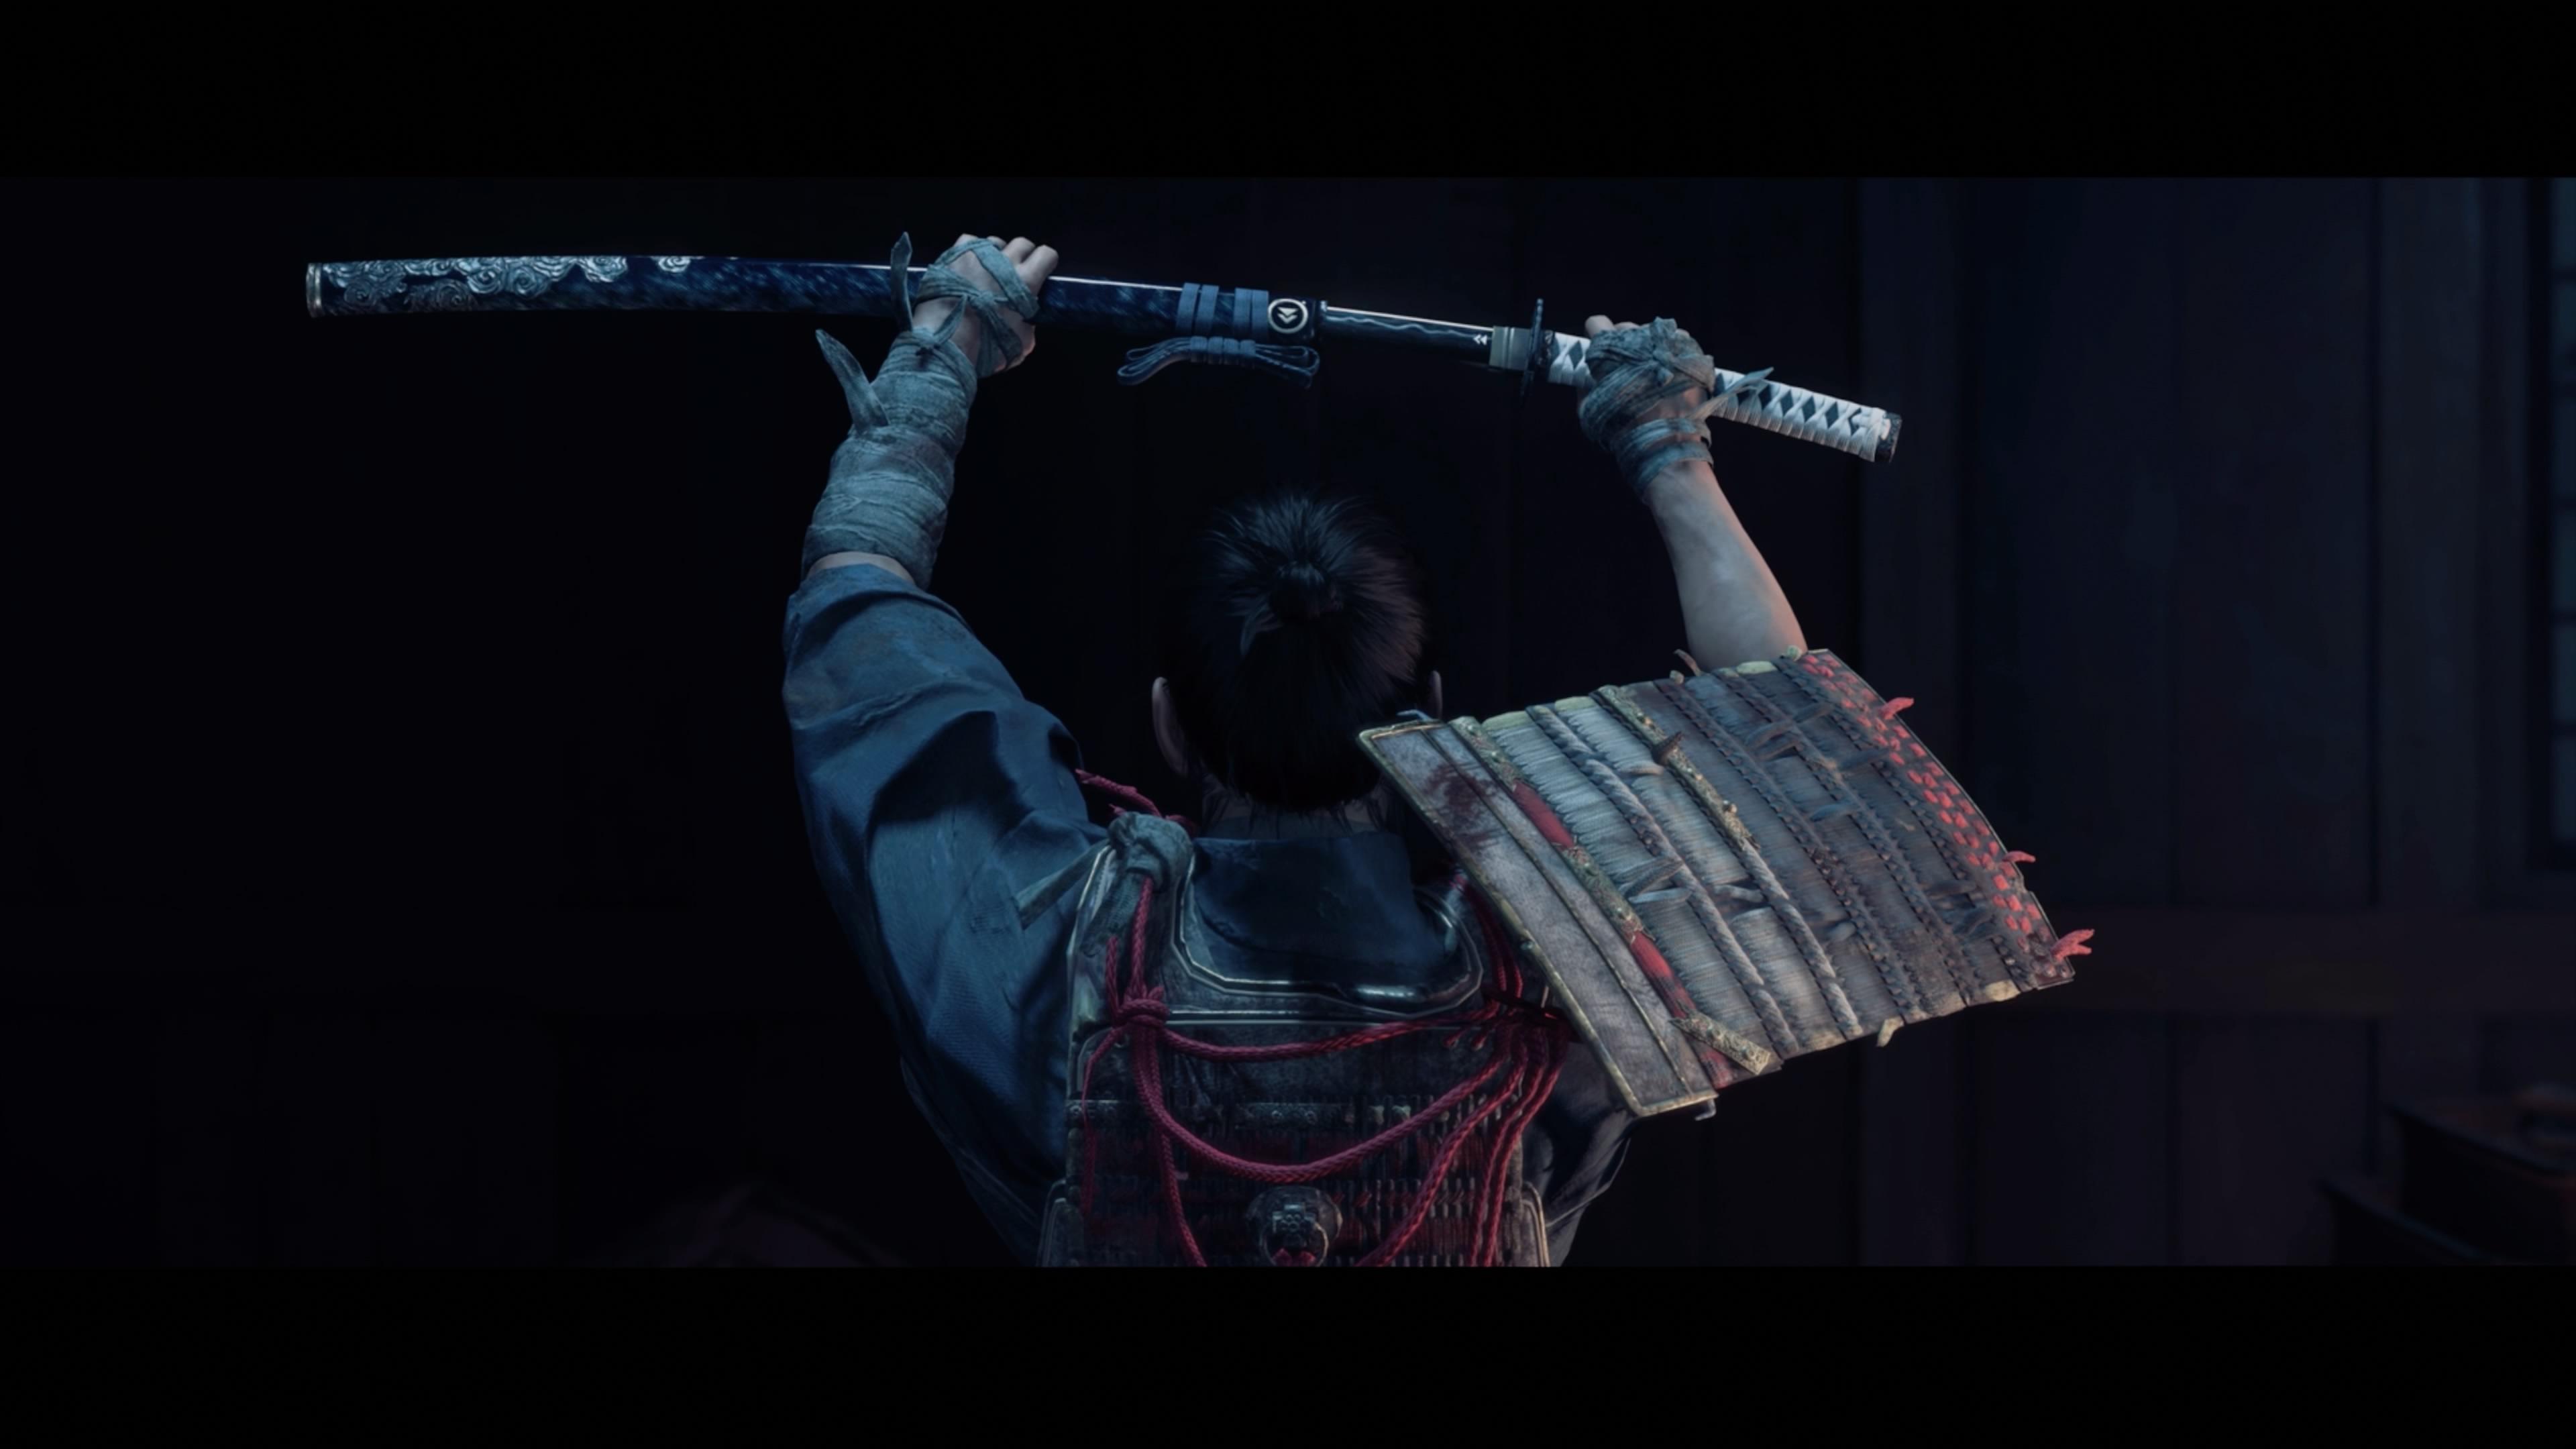 Ghost of Tsushima's main character draws his sword